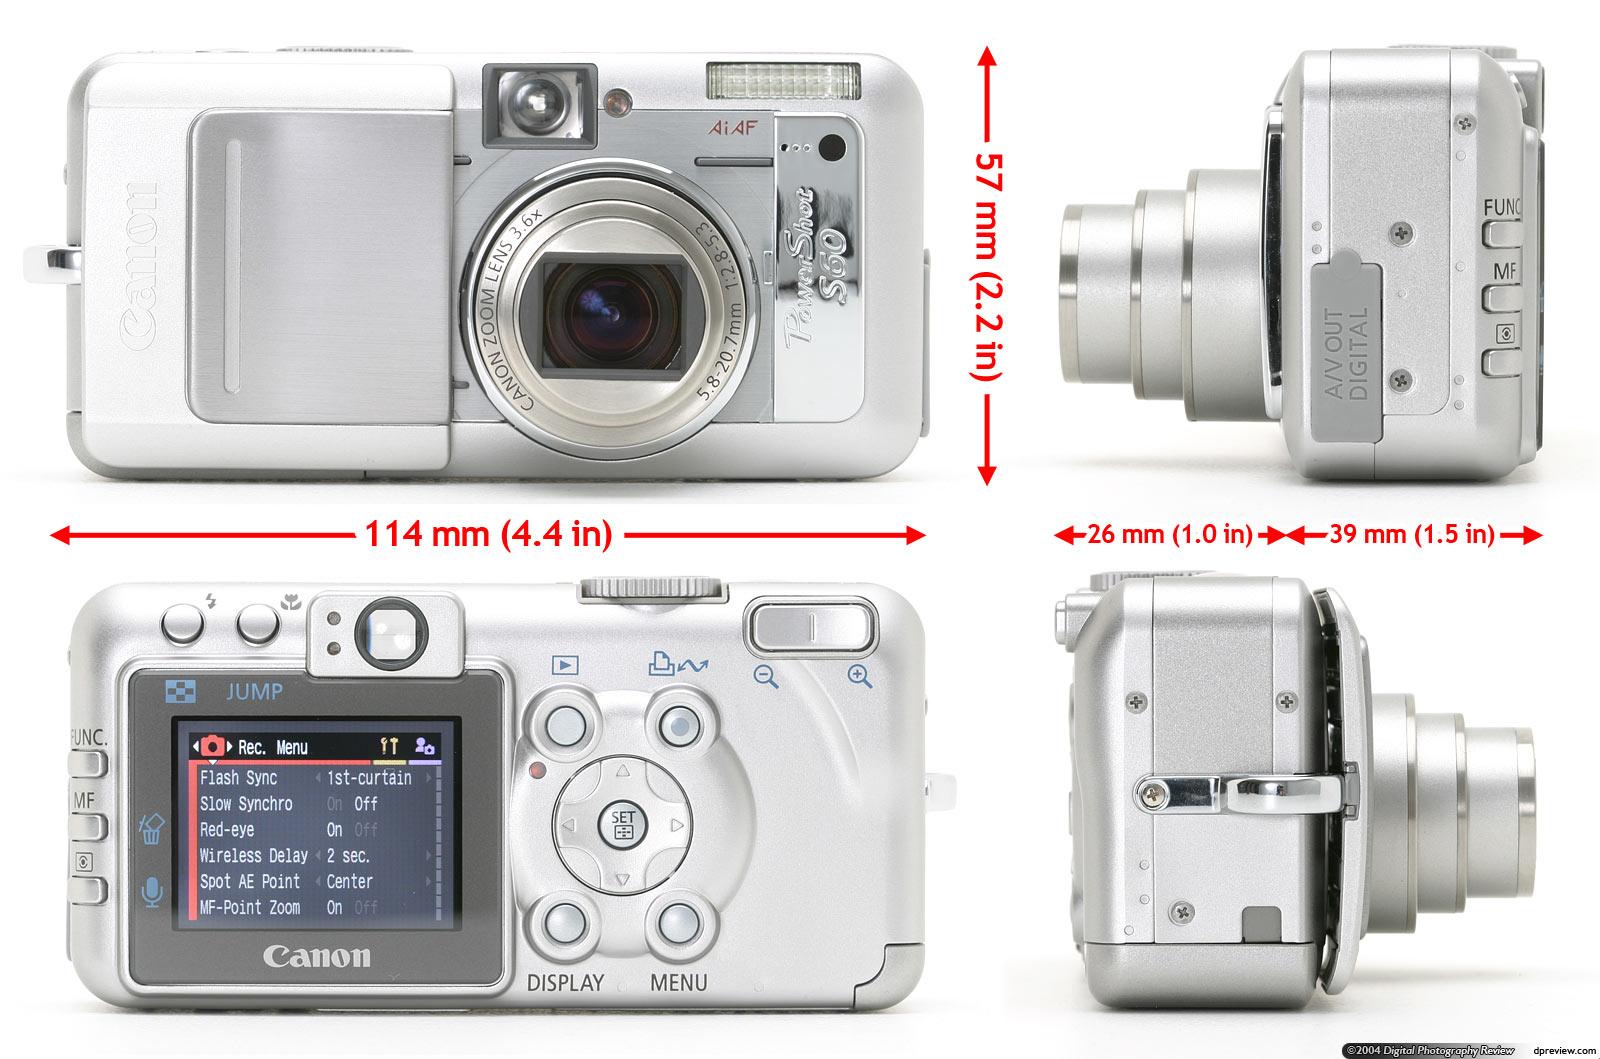 Canon Powershot S60 Review Digital Photography Ricoh Strap St 3 W Design